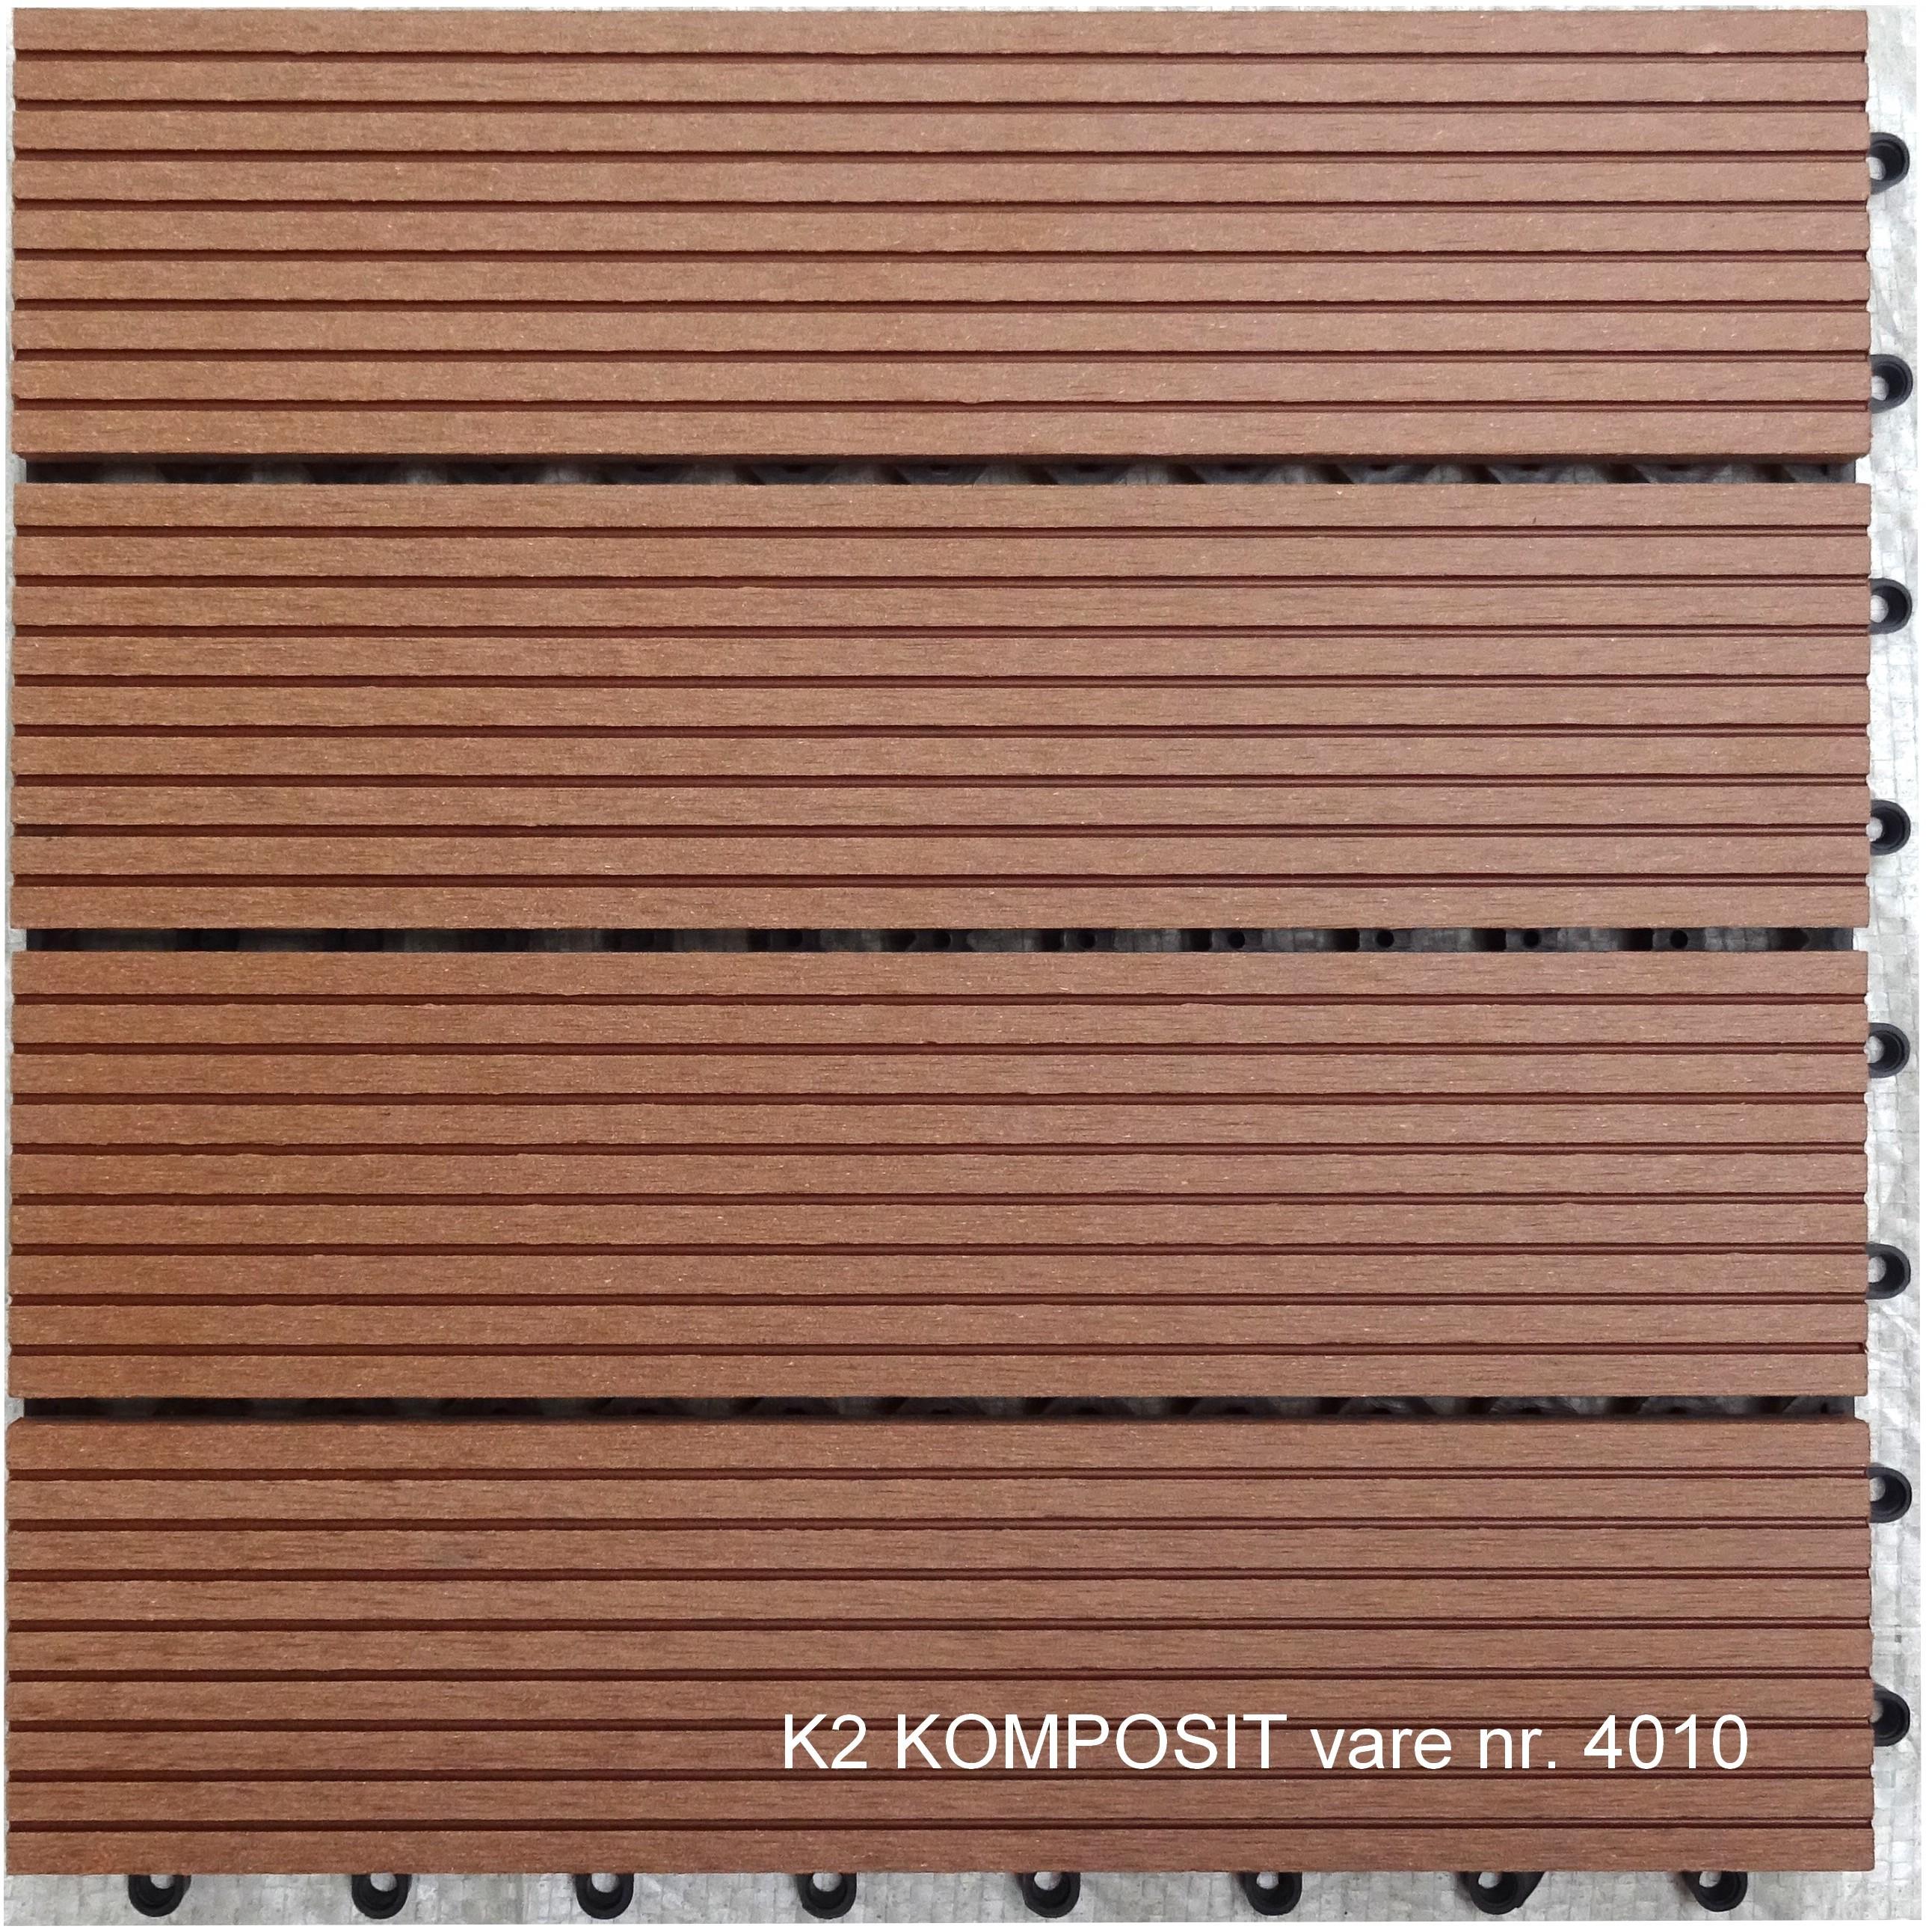 Picture of: K2 Komposit Klik Terrassefliser Teak 300x300x22 Mm K2 Komposit